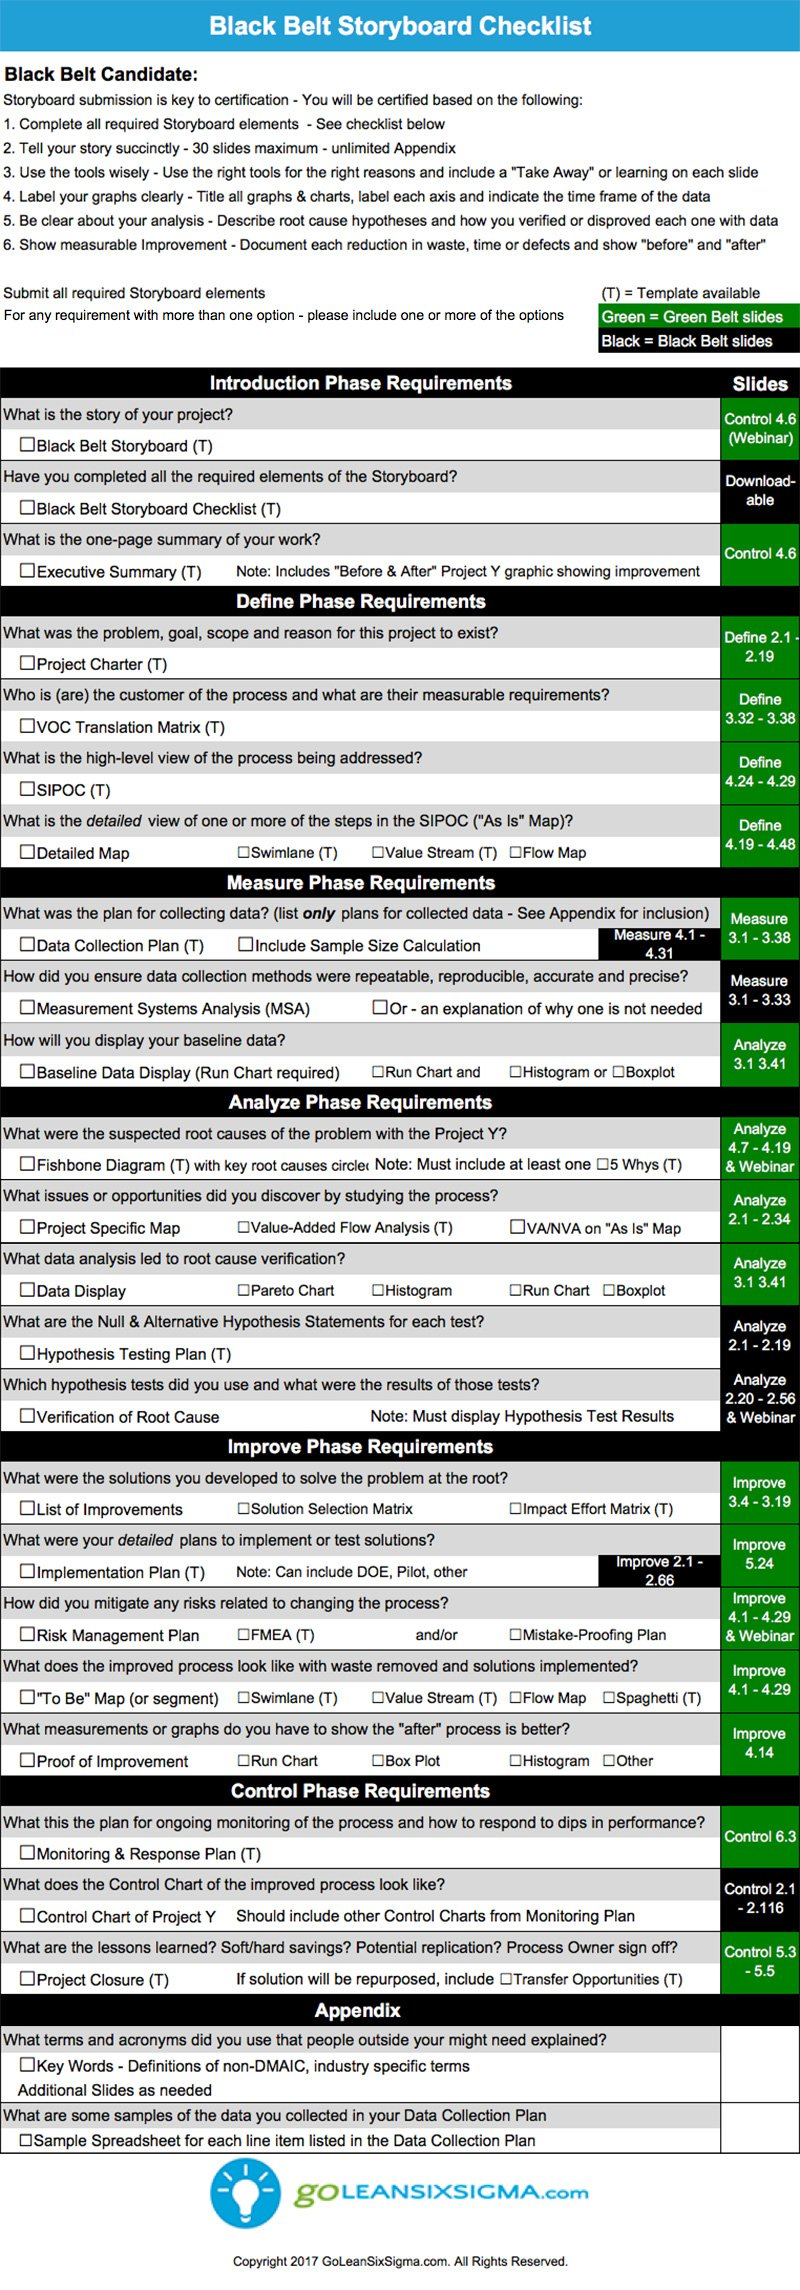 Black Belt Storyboard Checklist - GoLeanSixSigma.com